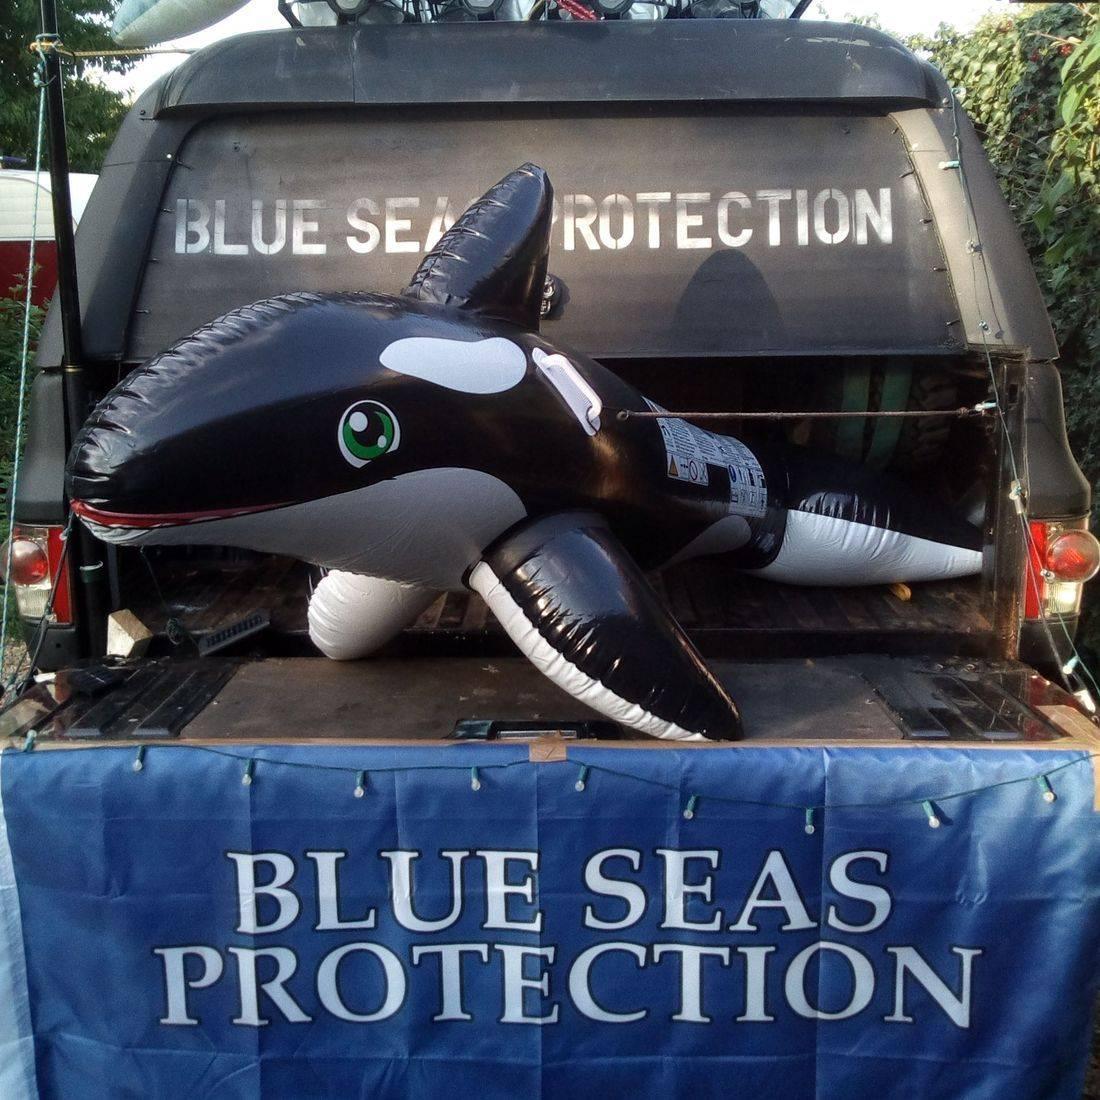 Faroes Denmark Whales guard fishing law